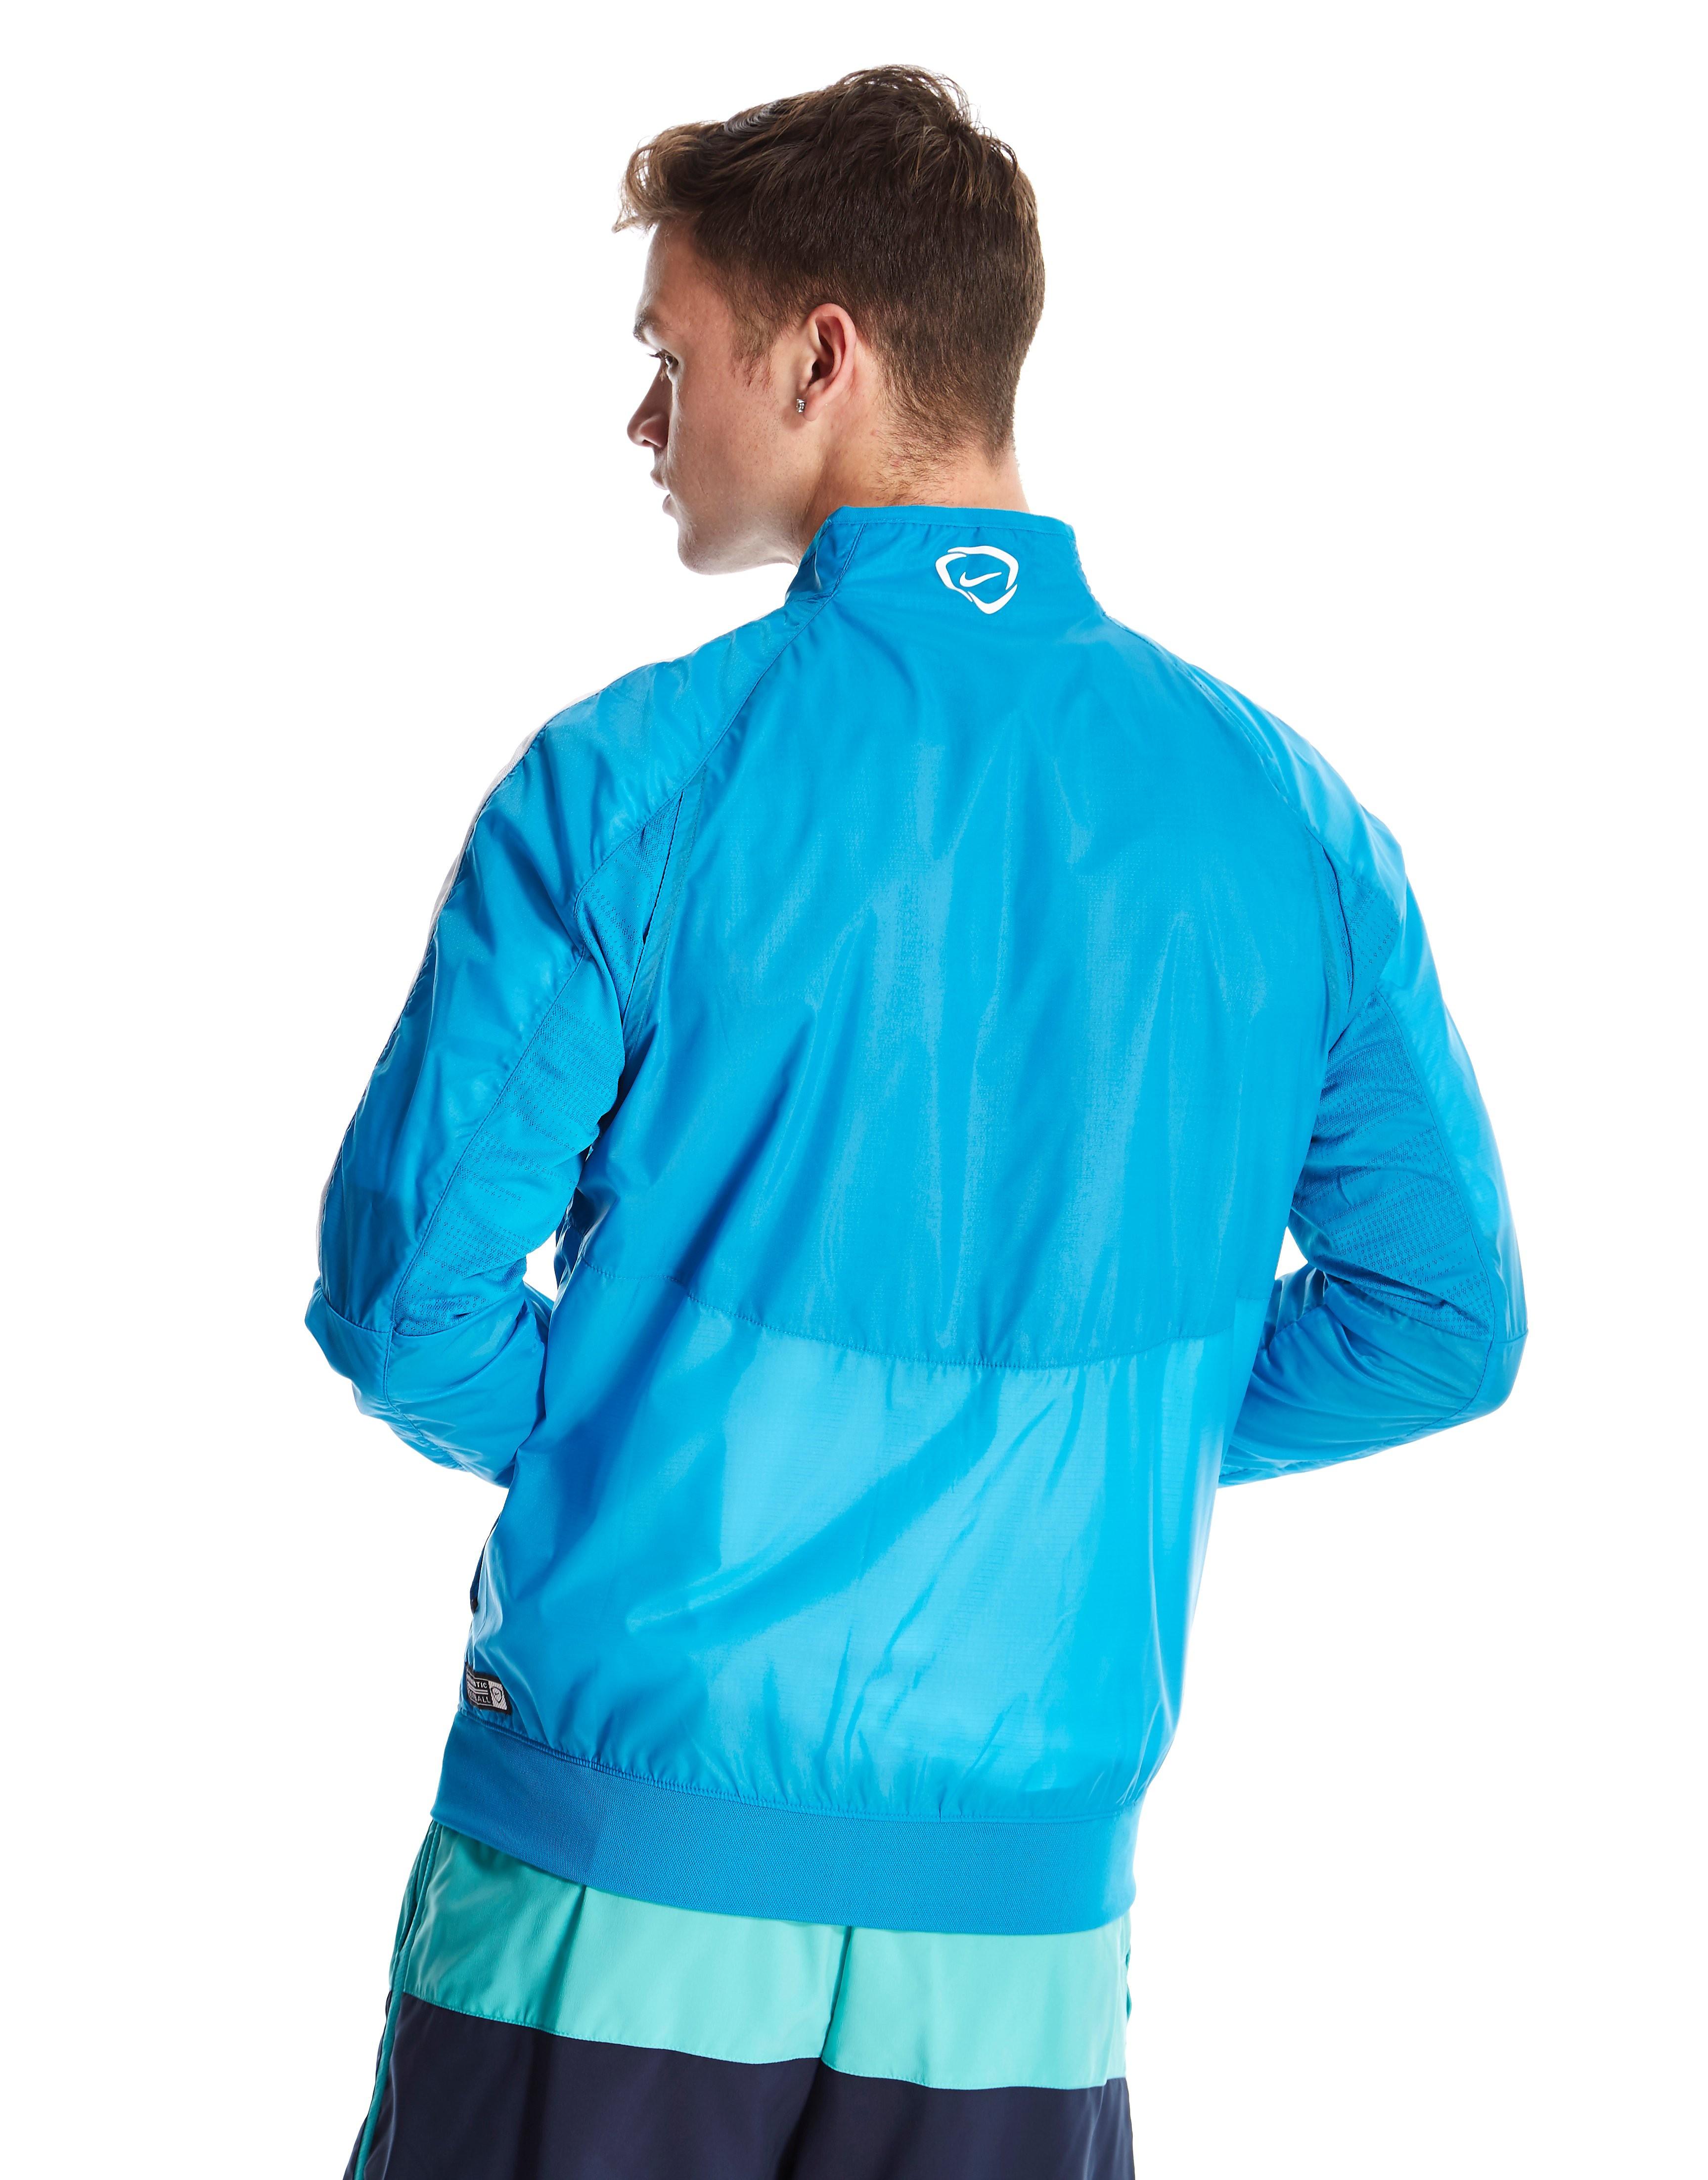 Nike GPX Woven Lightweight Jacket